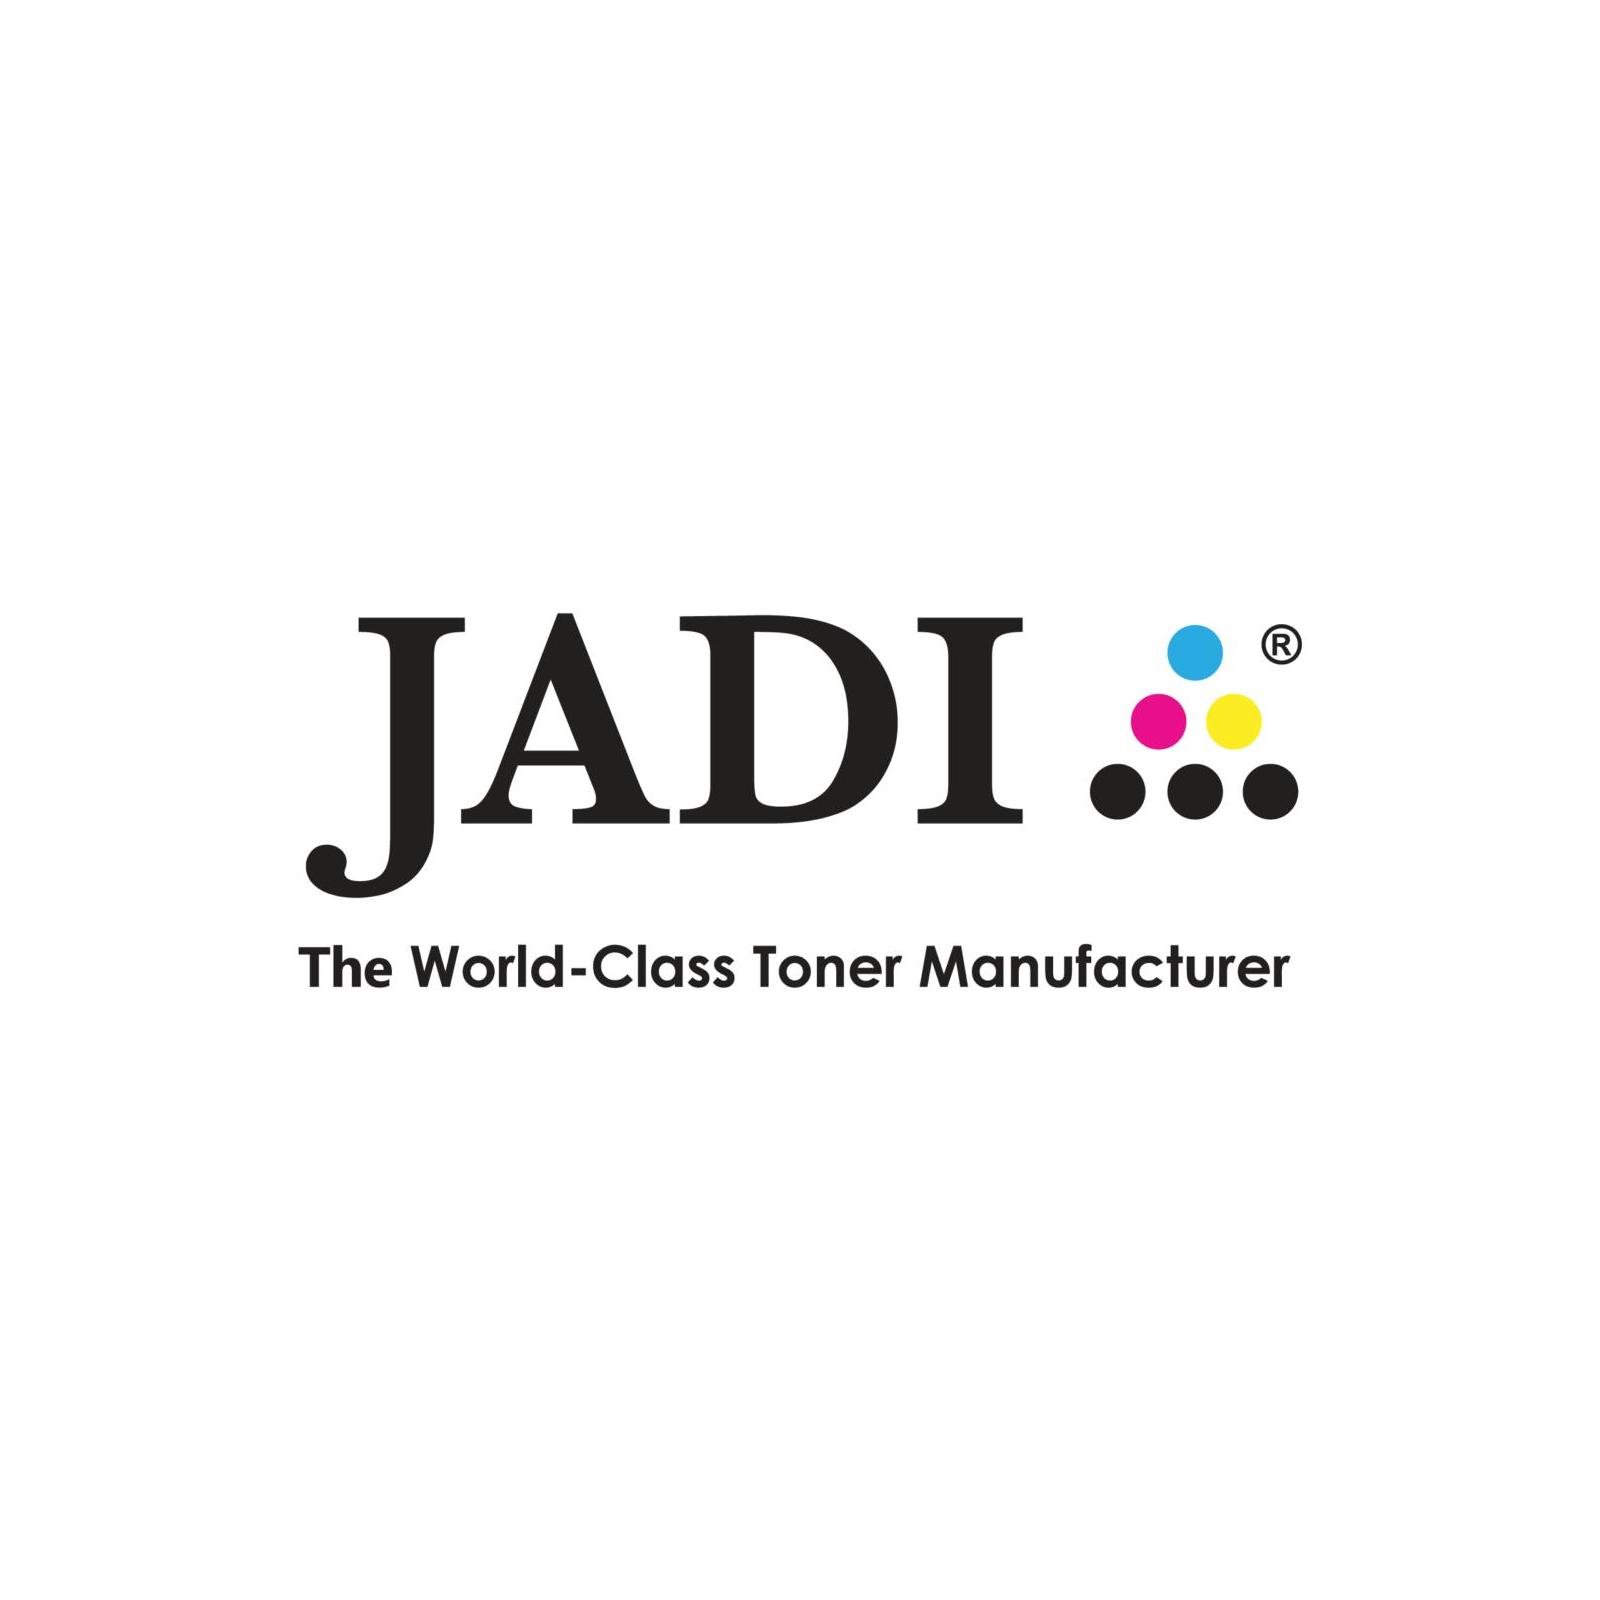 Тонер HP LJ1010/1160/1200/4250/P1005 SERVICE PACK 10x1кг Jadi (TSM-JLT-073-10SP)